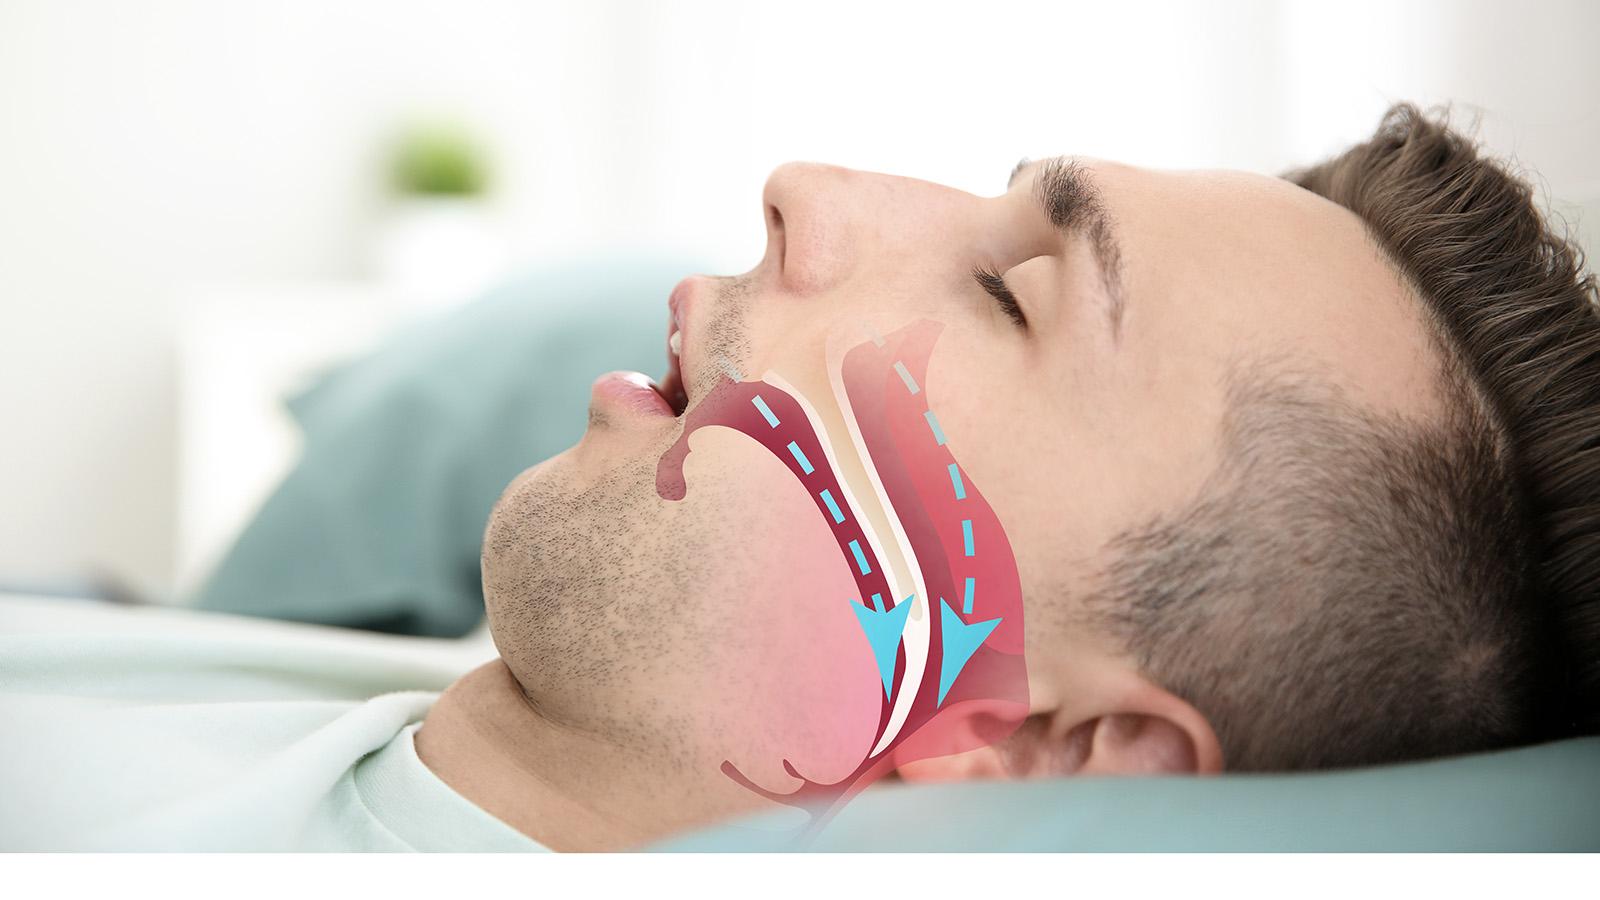 Atmung bei obstruktiver Schlafapnoe